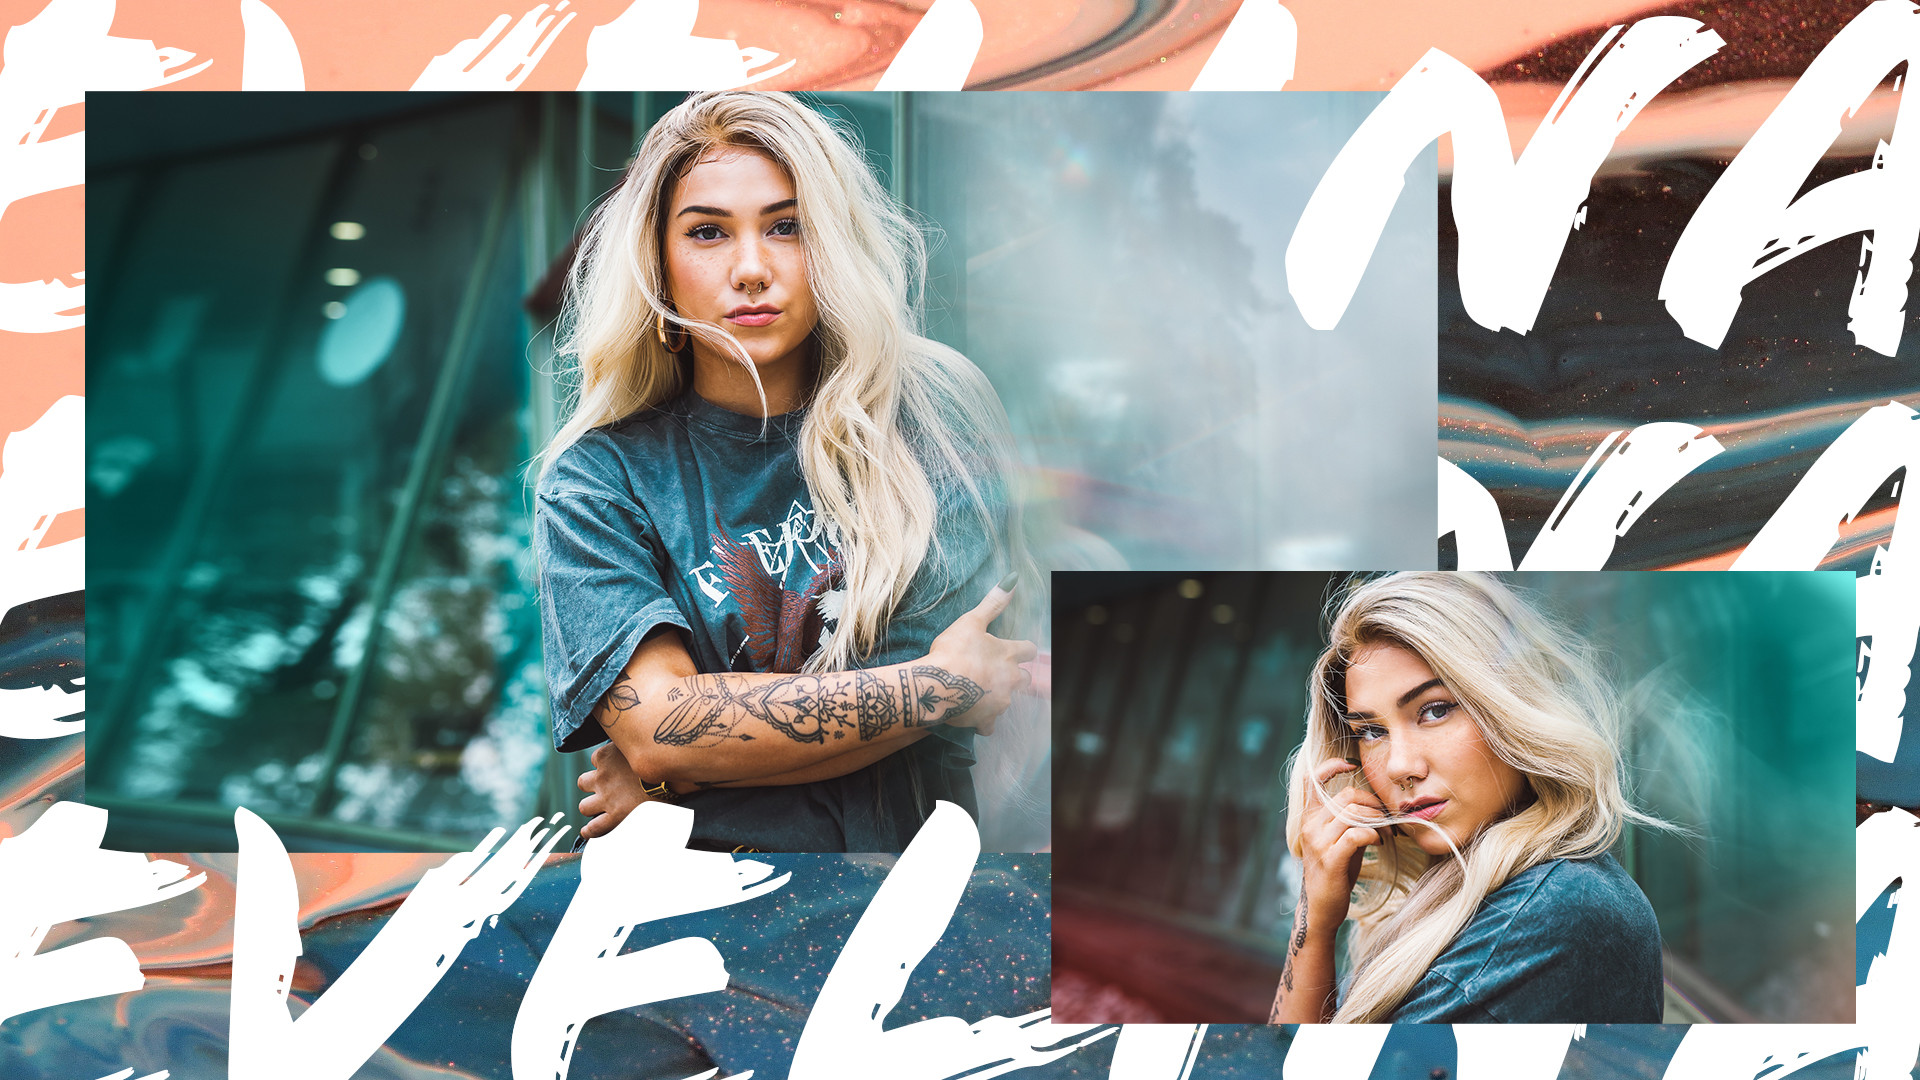 Evelina for YleX